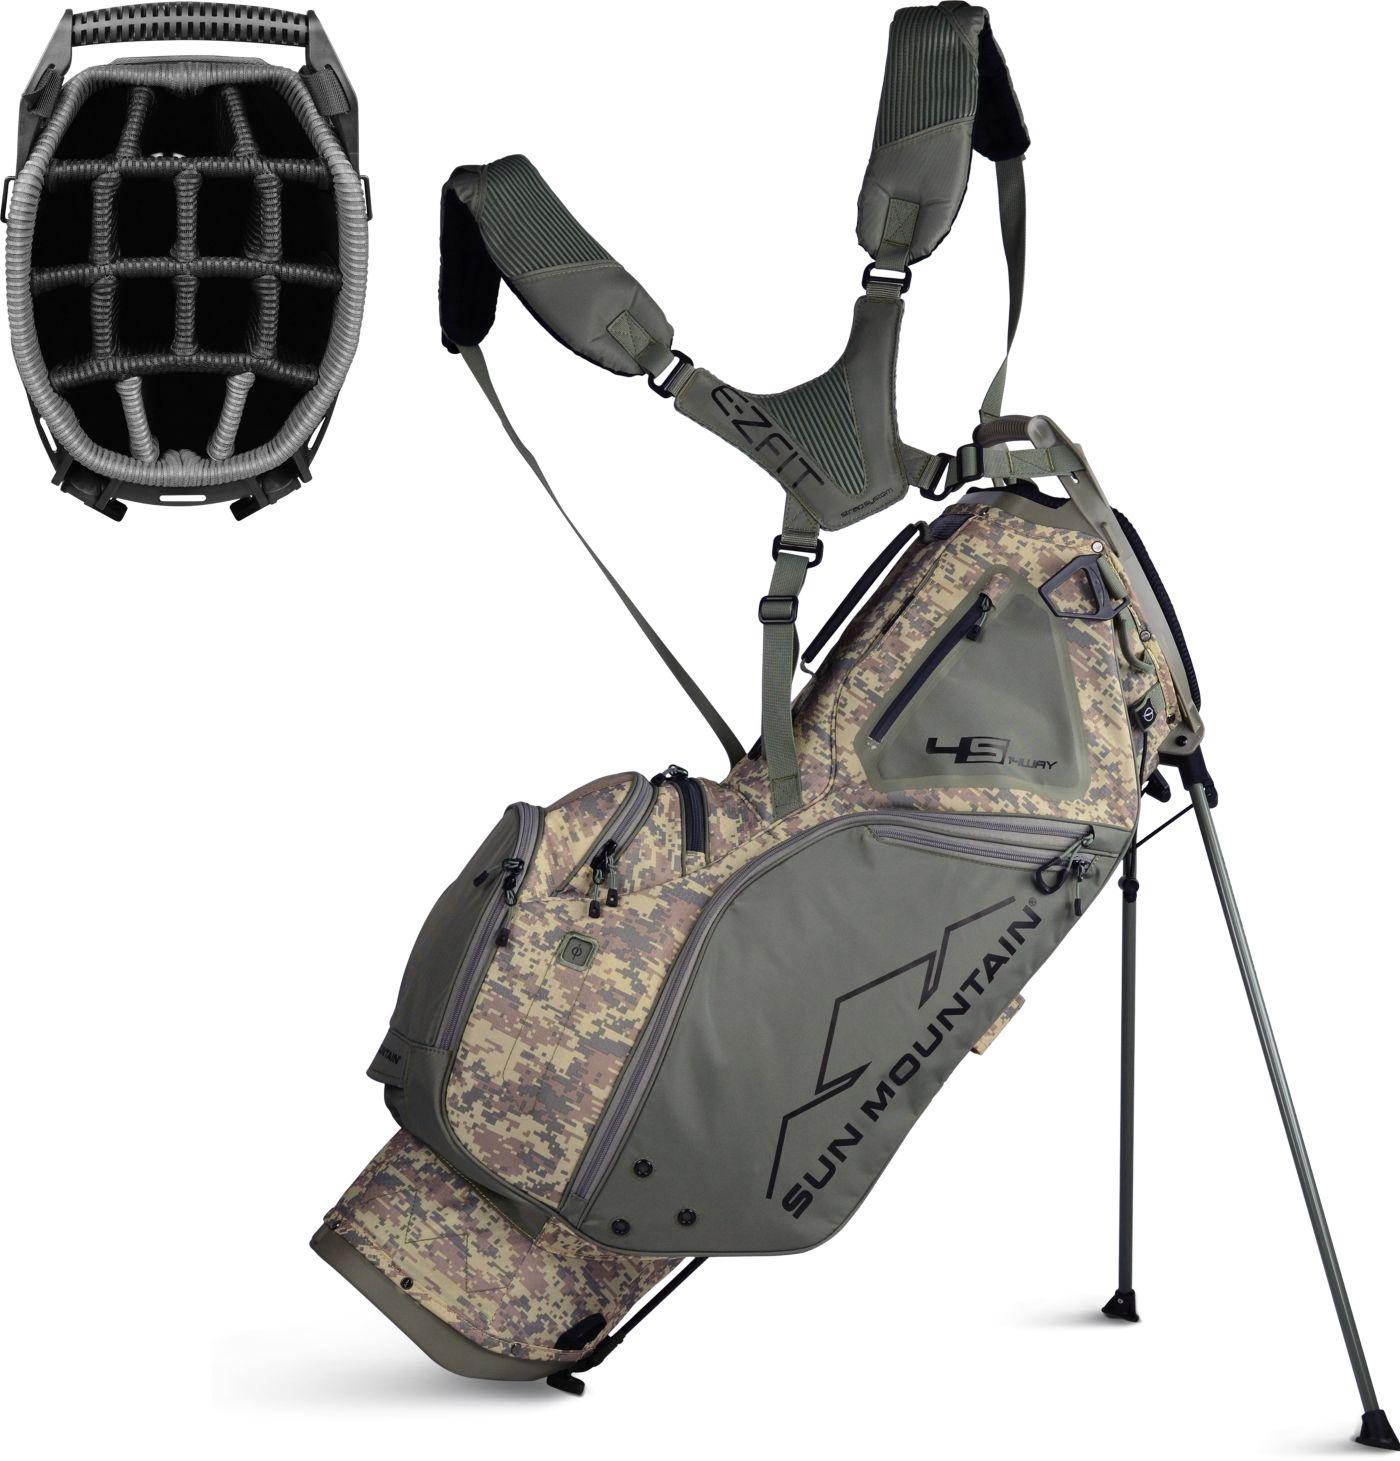 Sun Mountain 2019 4.5 LS 14-Way Stand Golf Bag